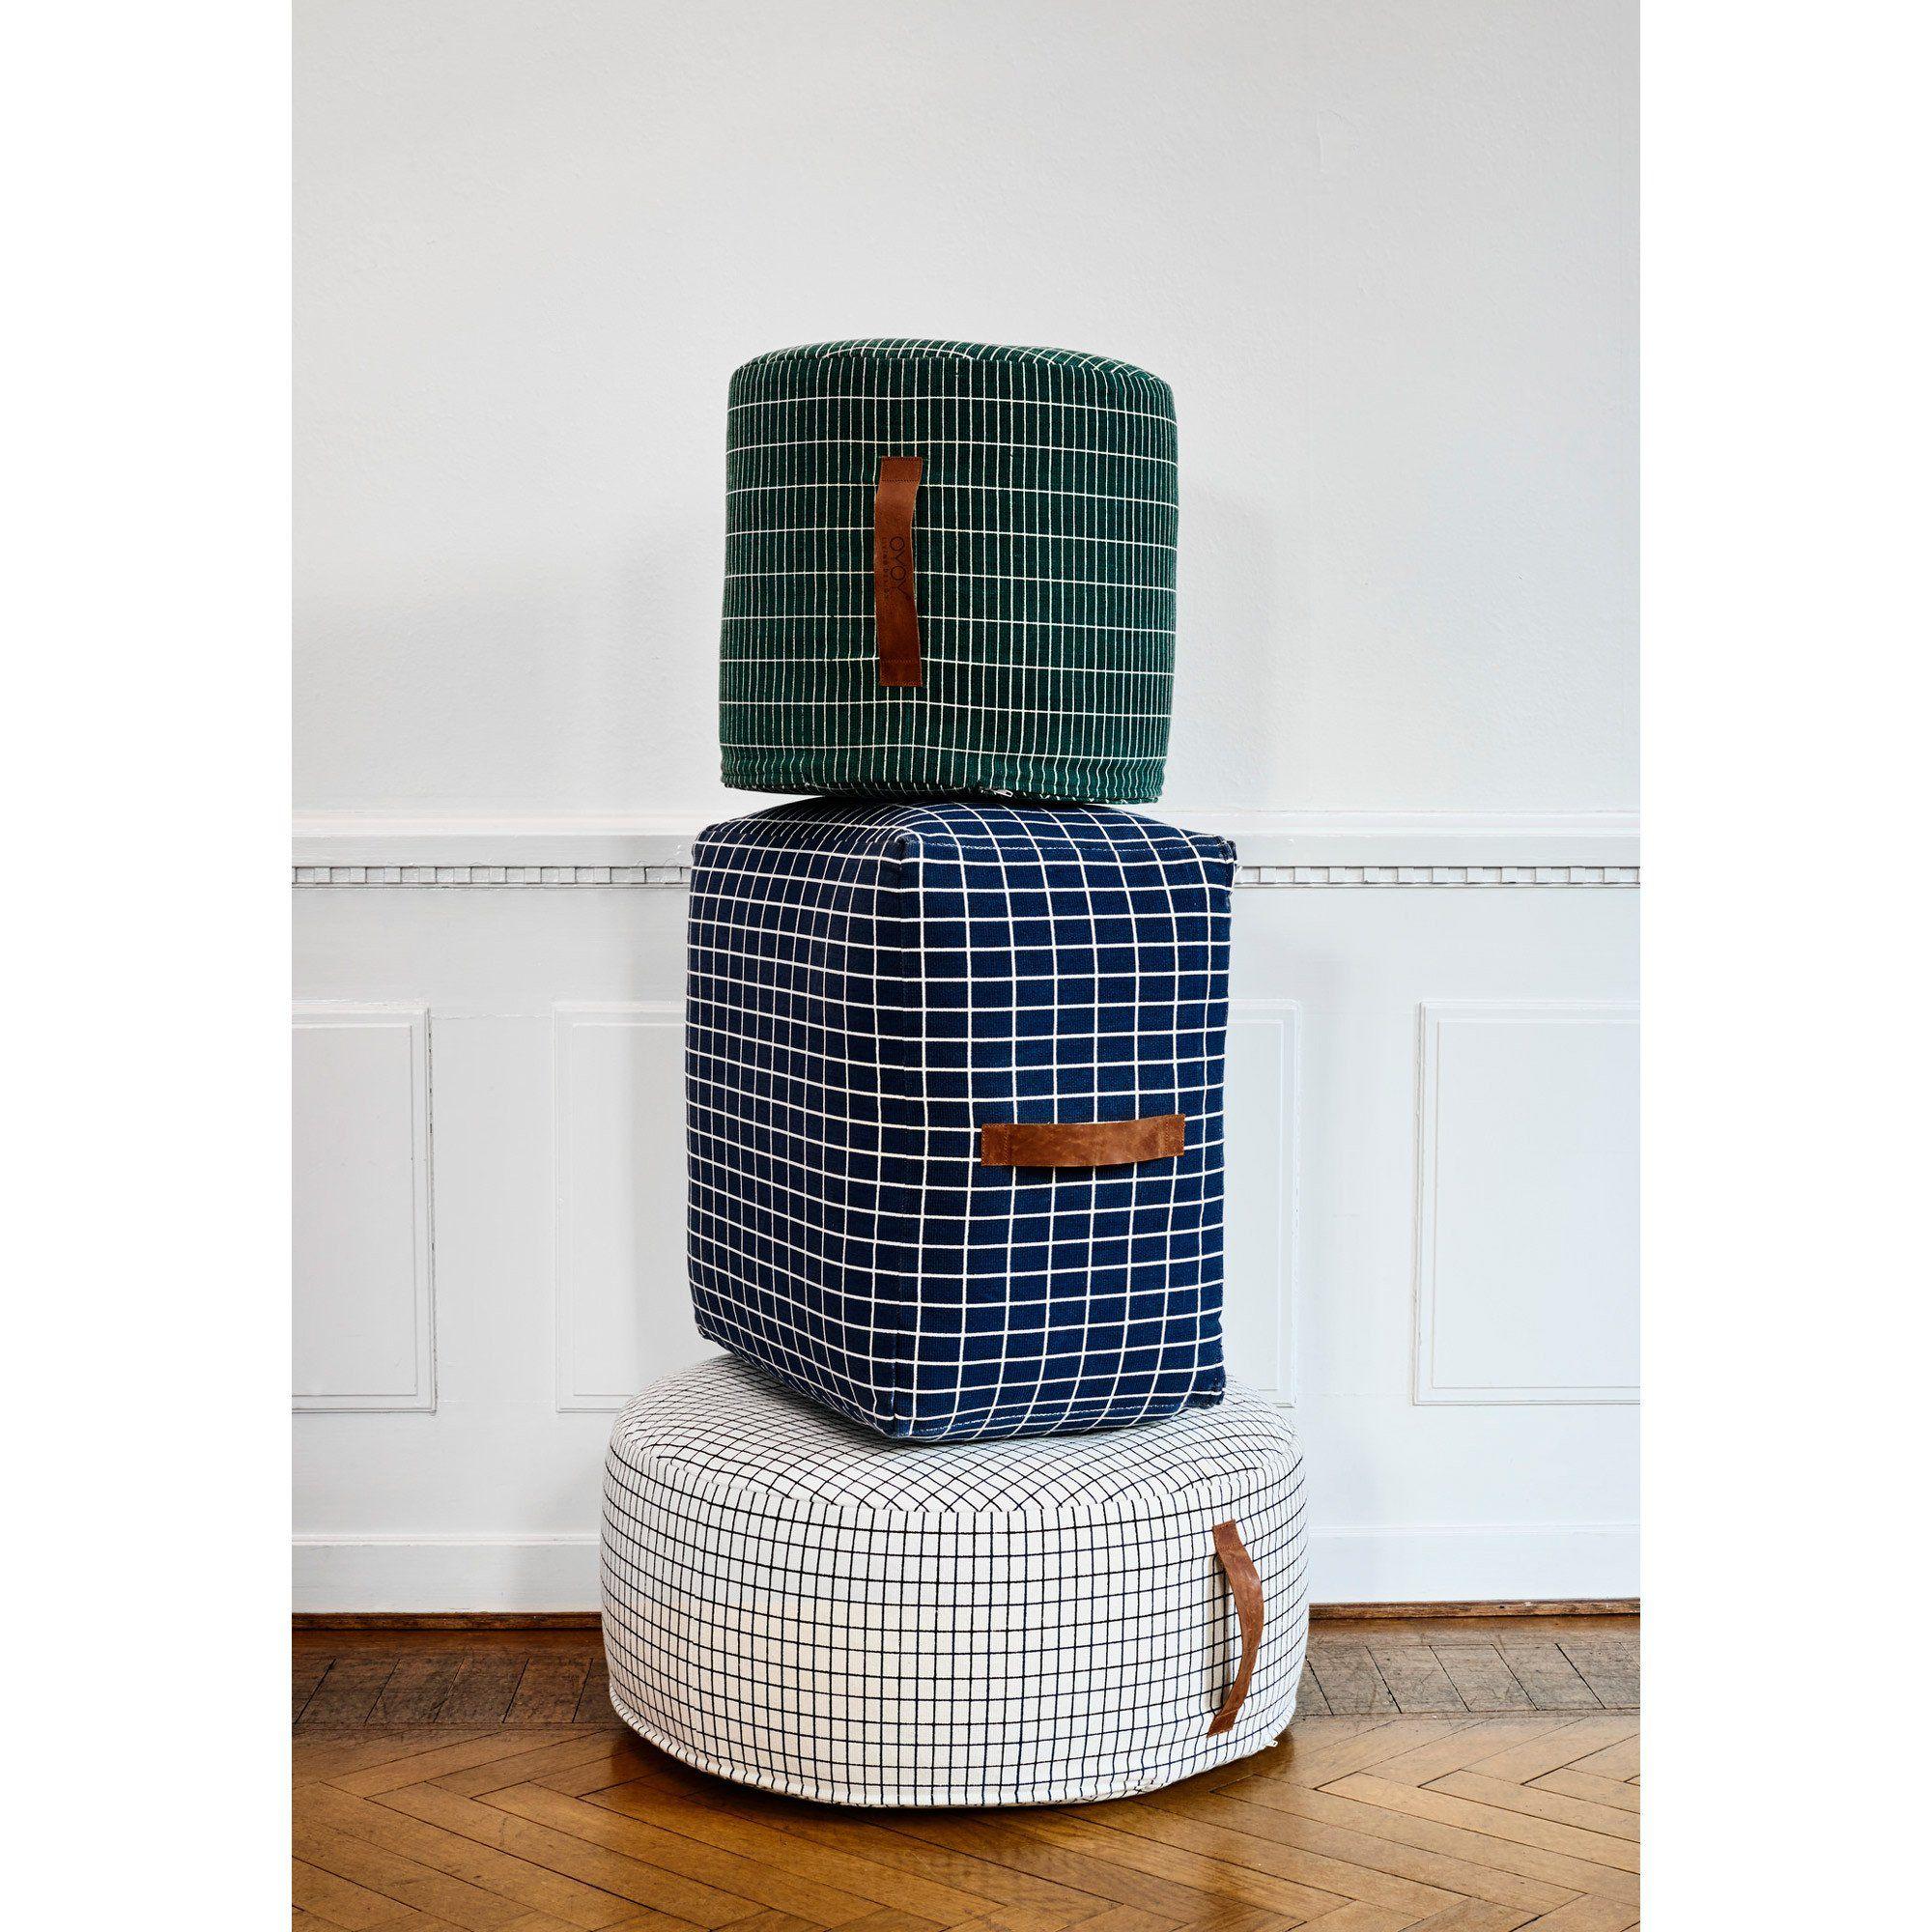 Sit On Me Pouf Cylinder Green Pouf Footstool Scandinavian Furniture Styrofoam Ball